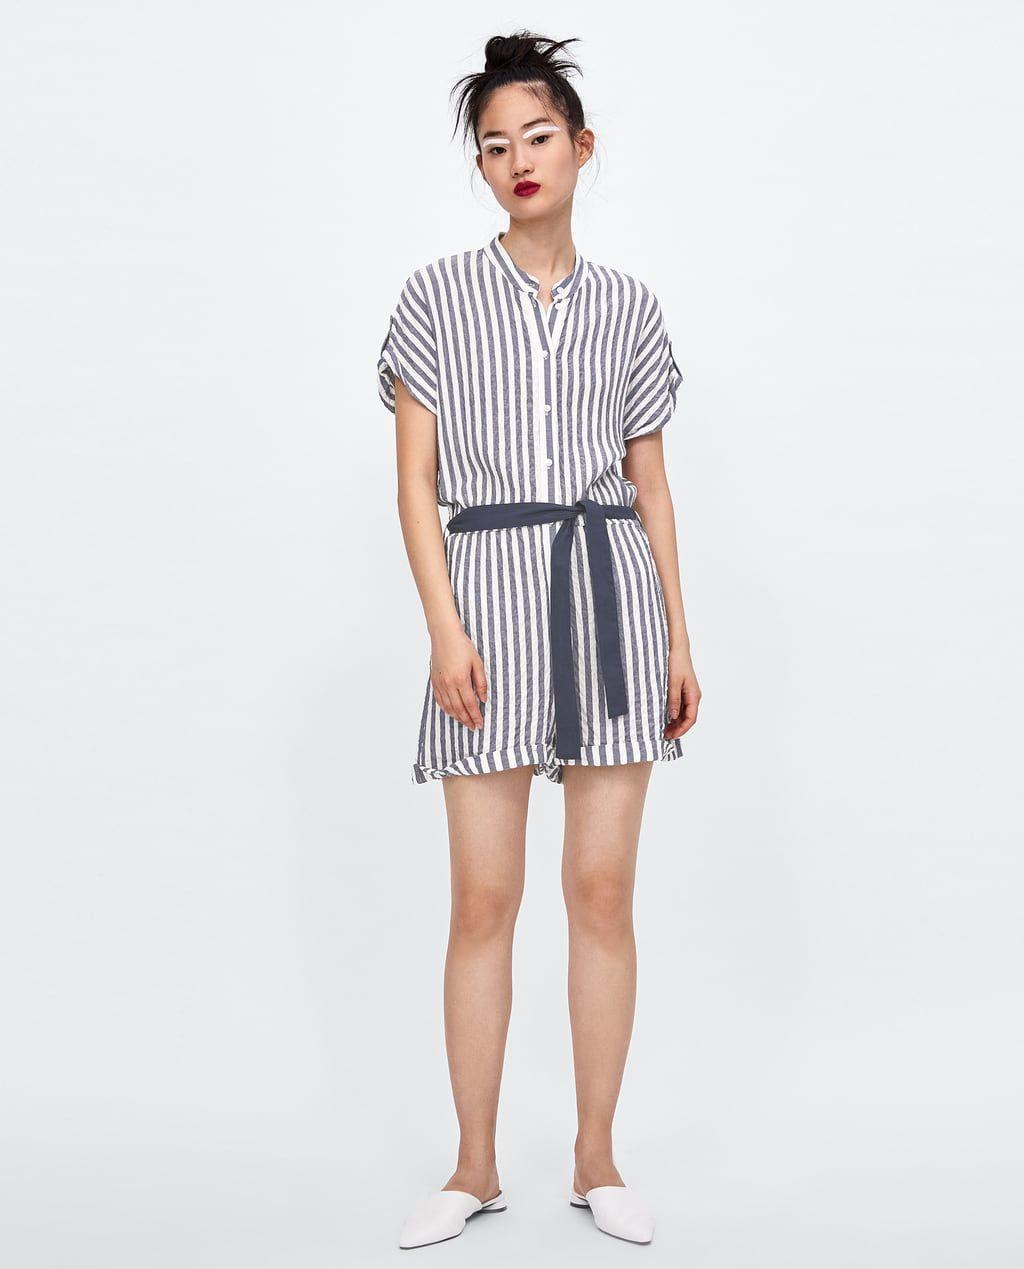 51010eff4cf Zara STRIPED JUMPSUIT WITH BELT DETAILS 49.90 USD COLOR  Blue   White  9006 151